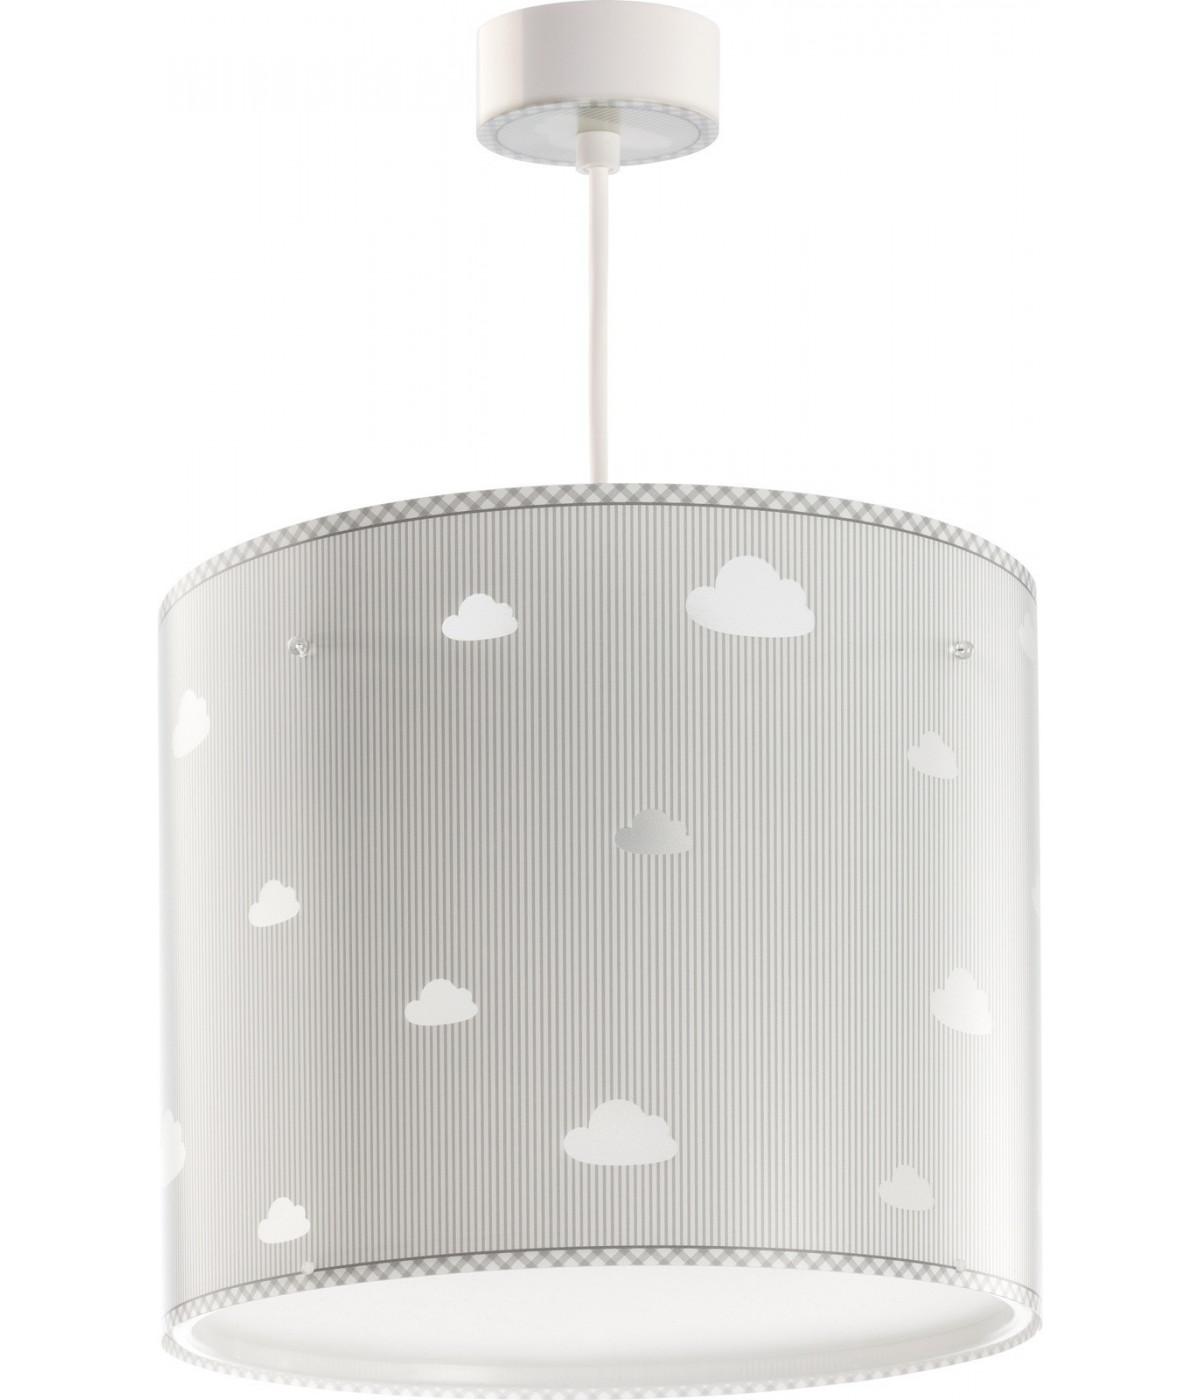 Hanging lamp for Kids Sweet Dreams grey